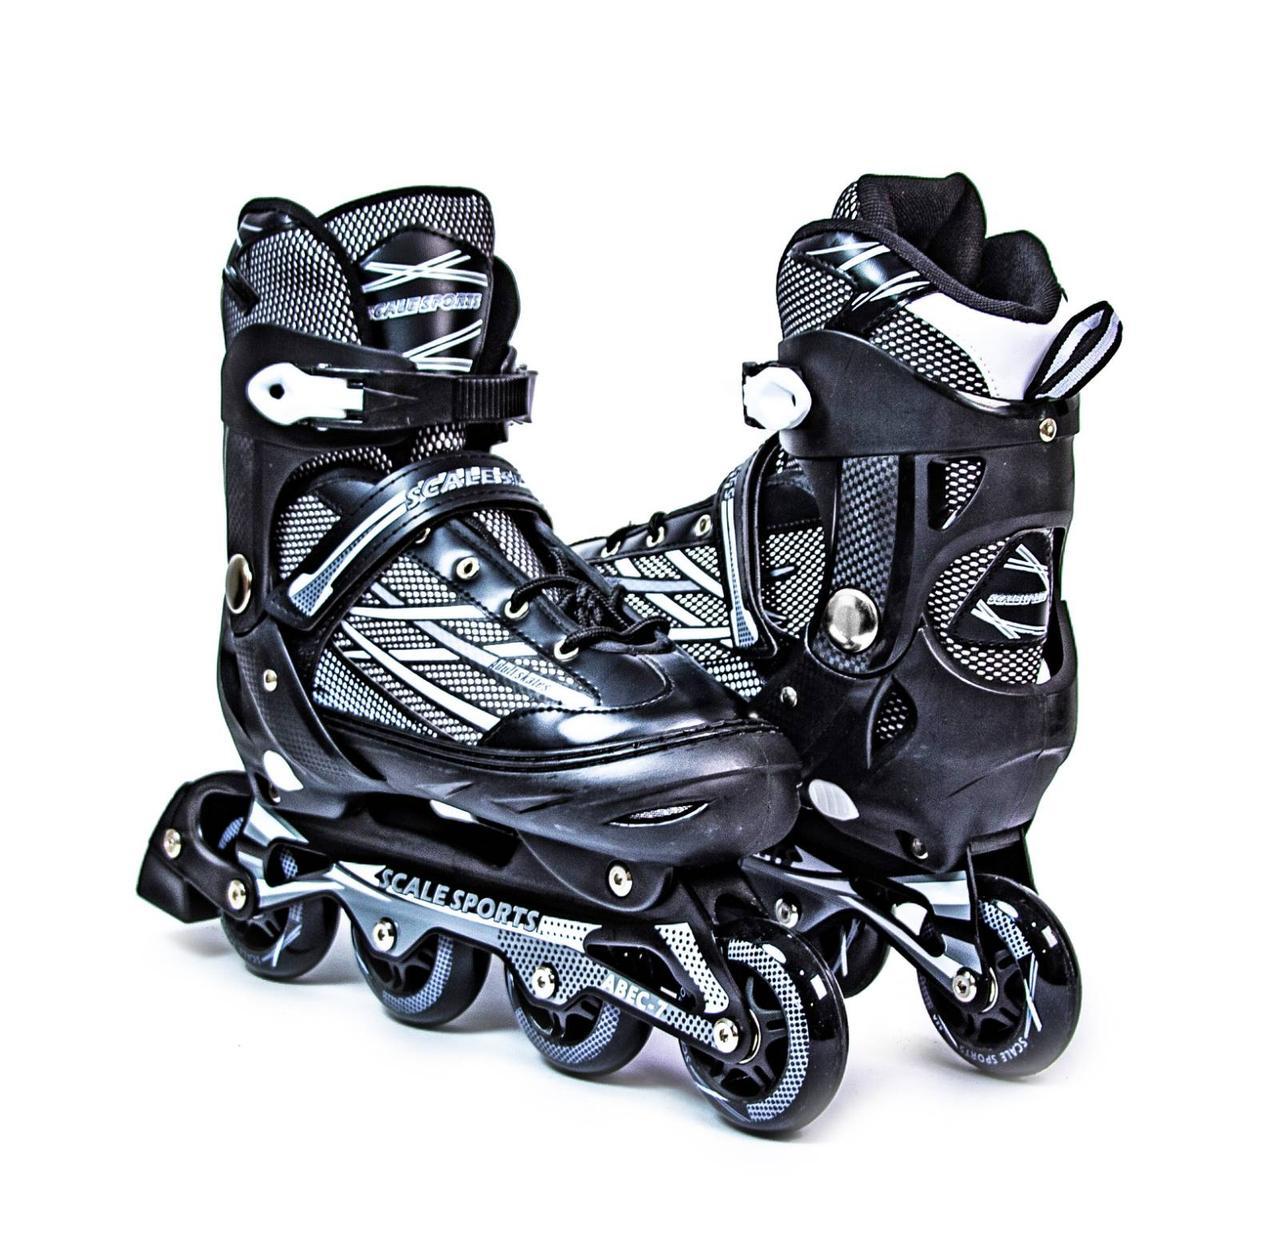 Ролики Scale Sports. Adult Skates. XL LF 935 Black 41-44